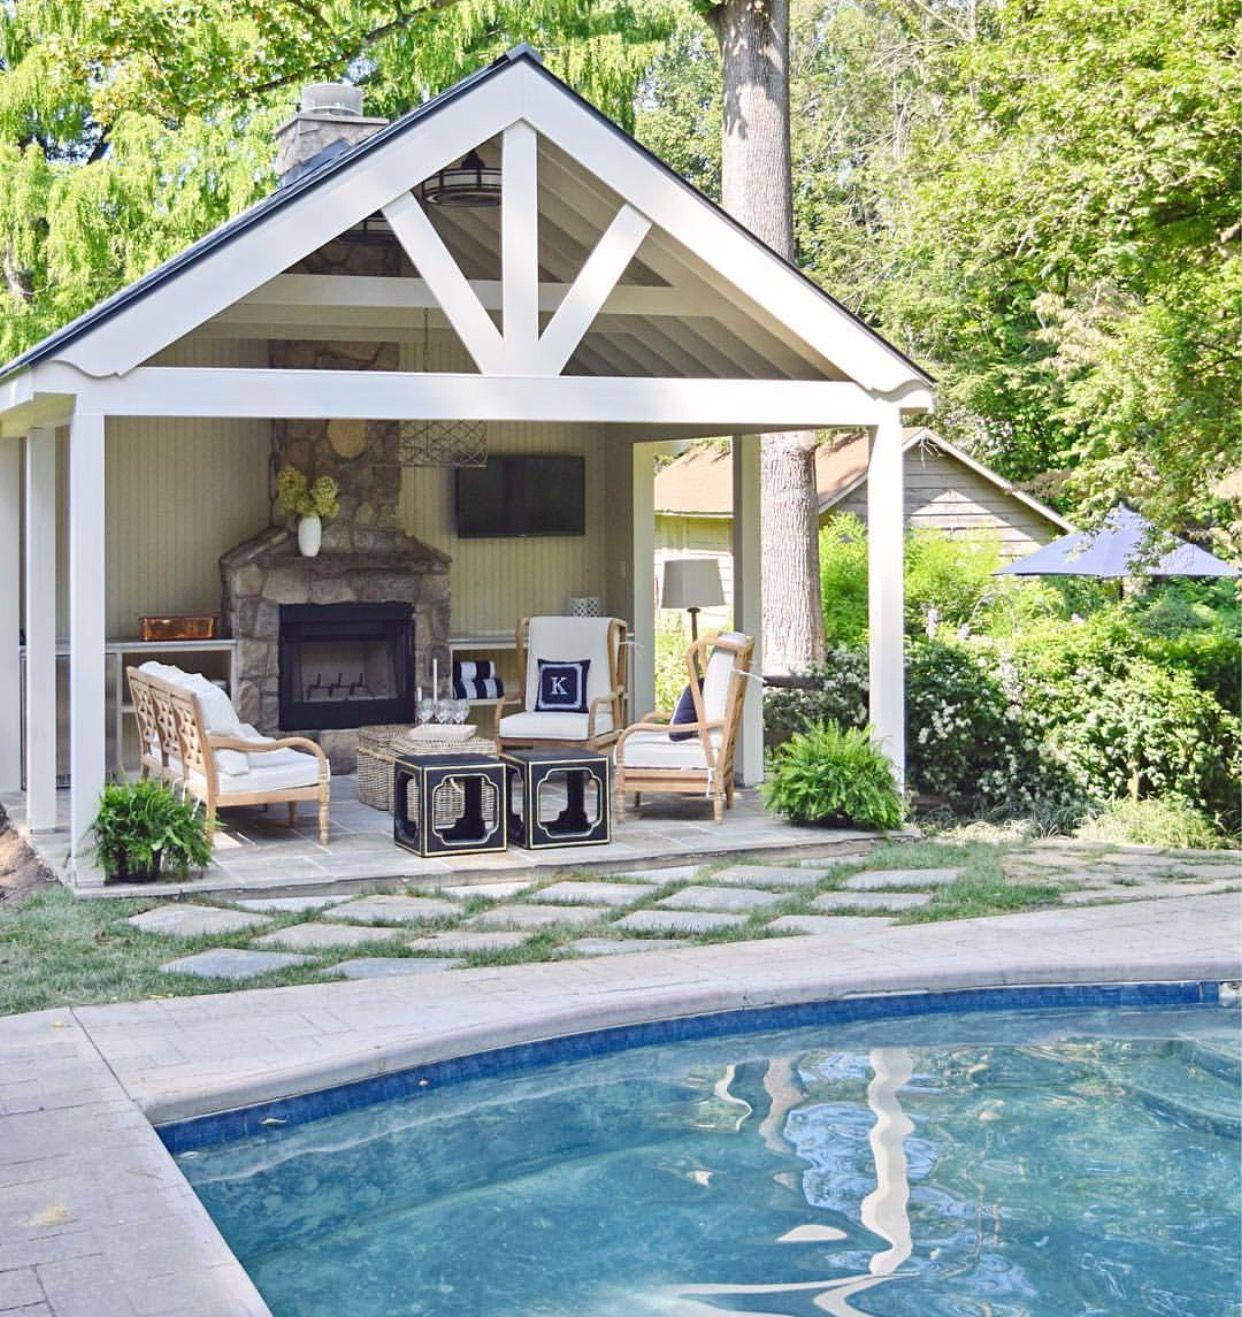 Pool House Backyard Pavilion Pool House Designs Pool Houses Backyard pool house designs